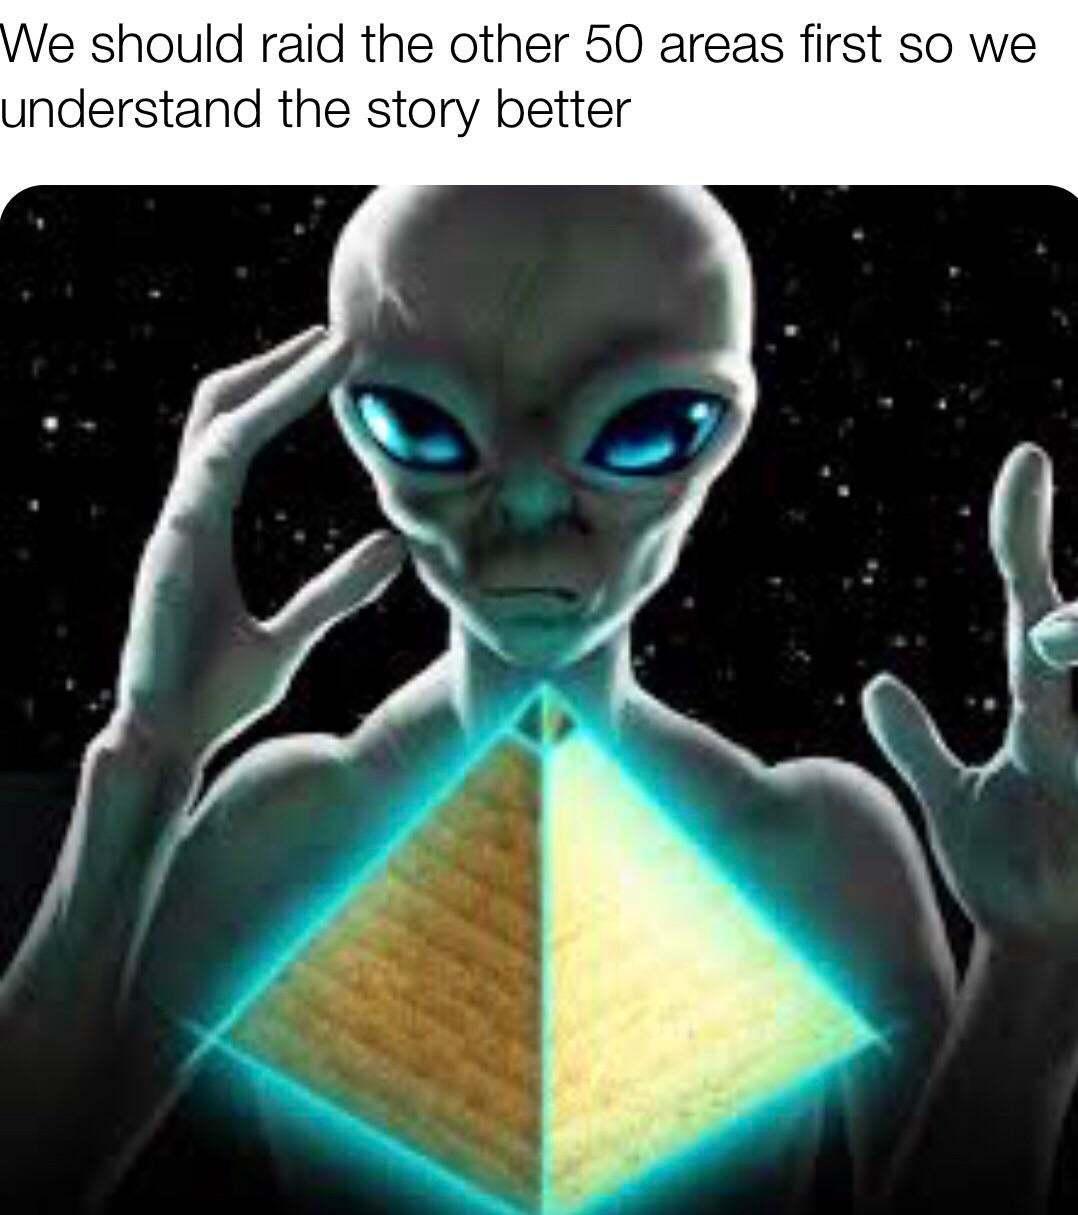 Only 3 days - meme